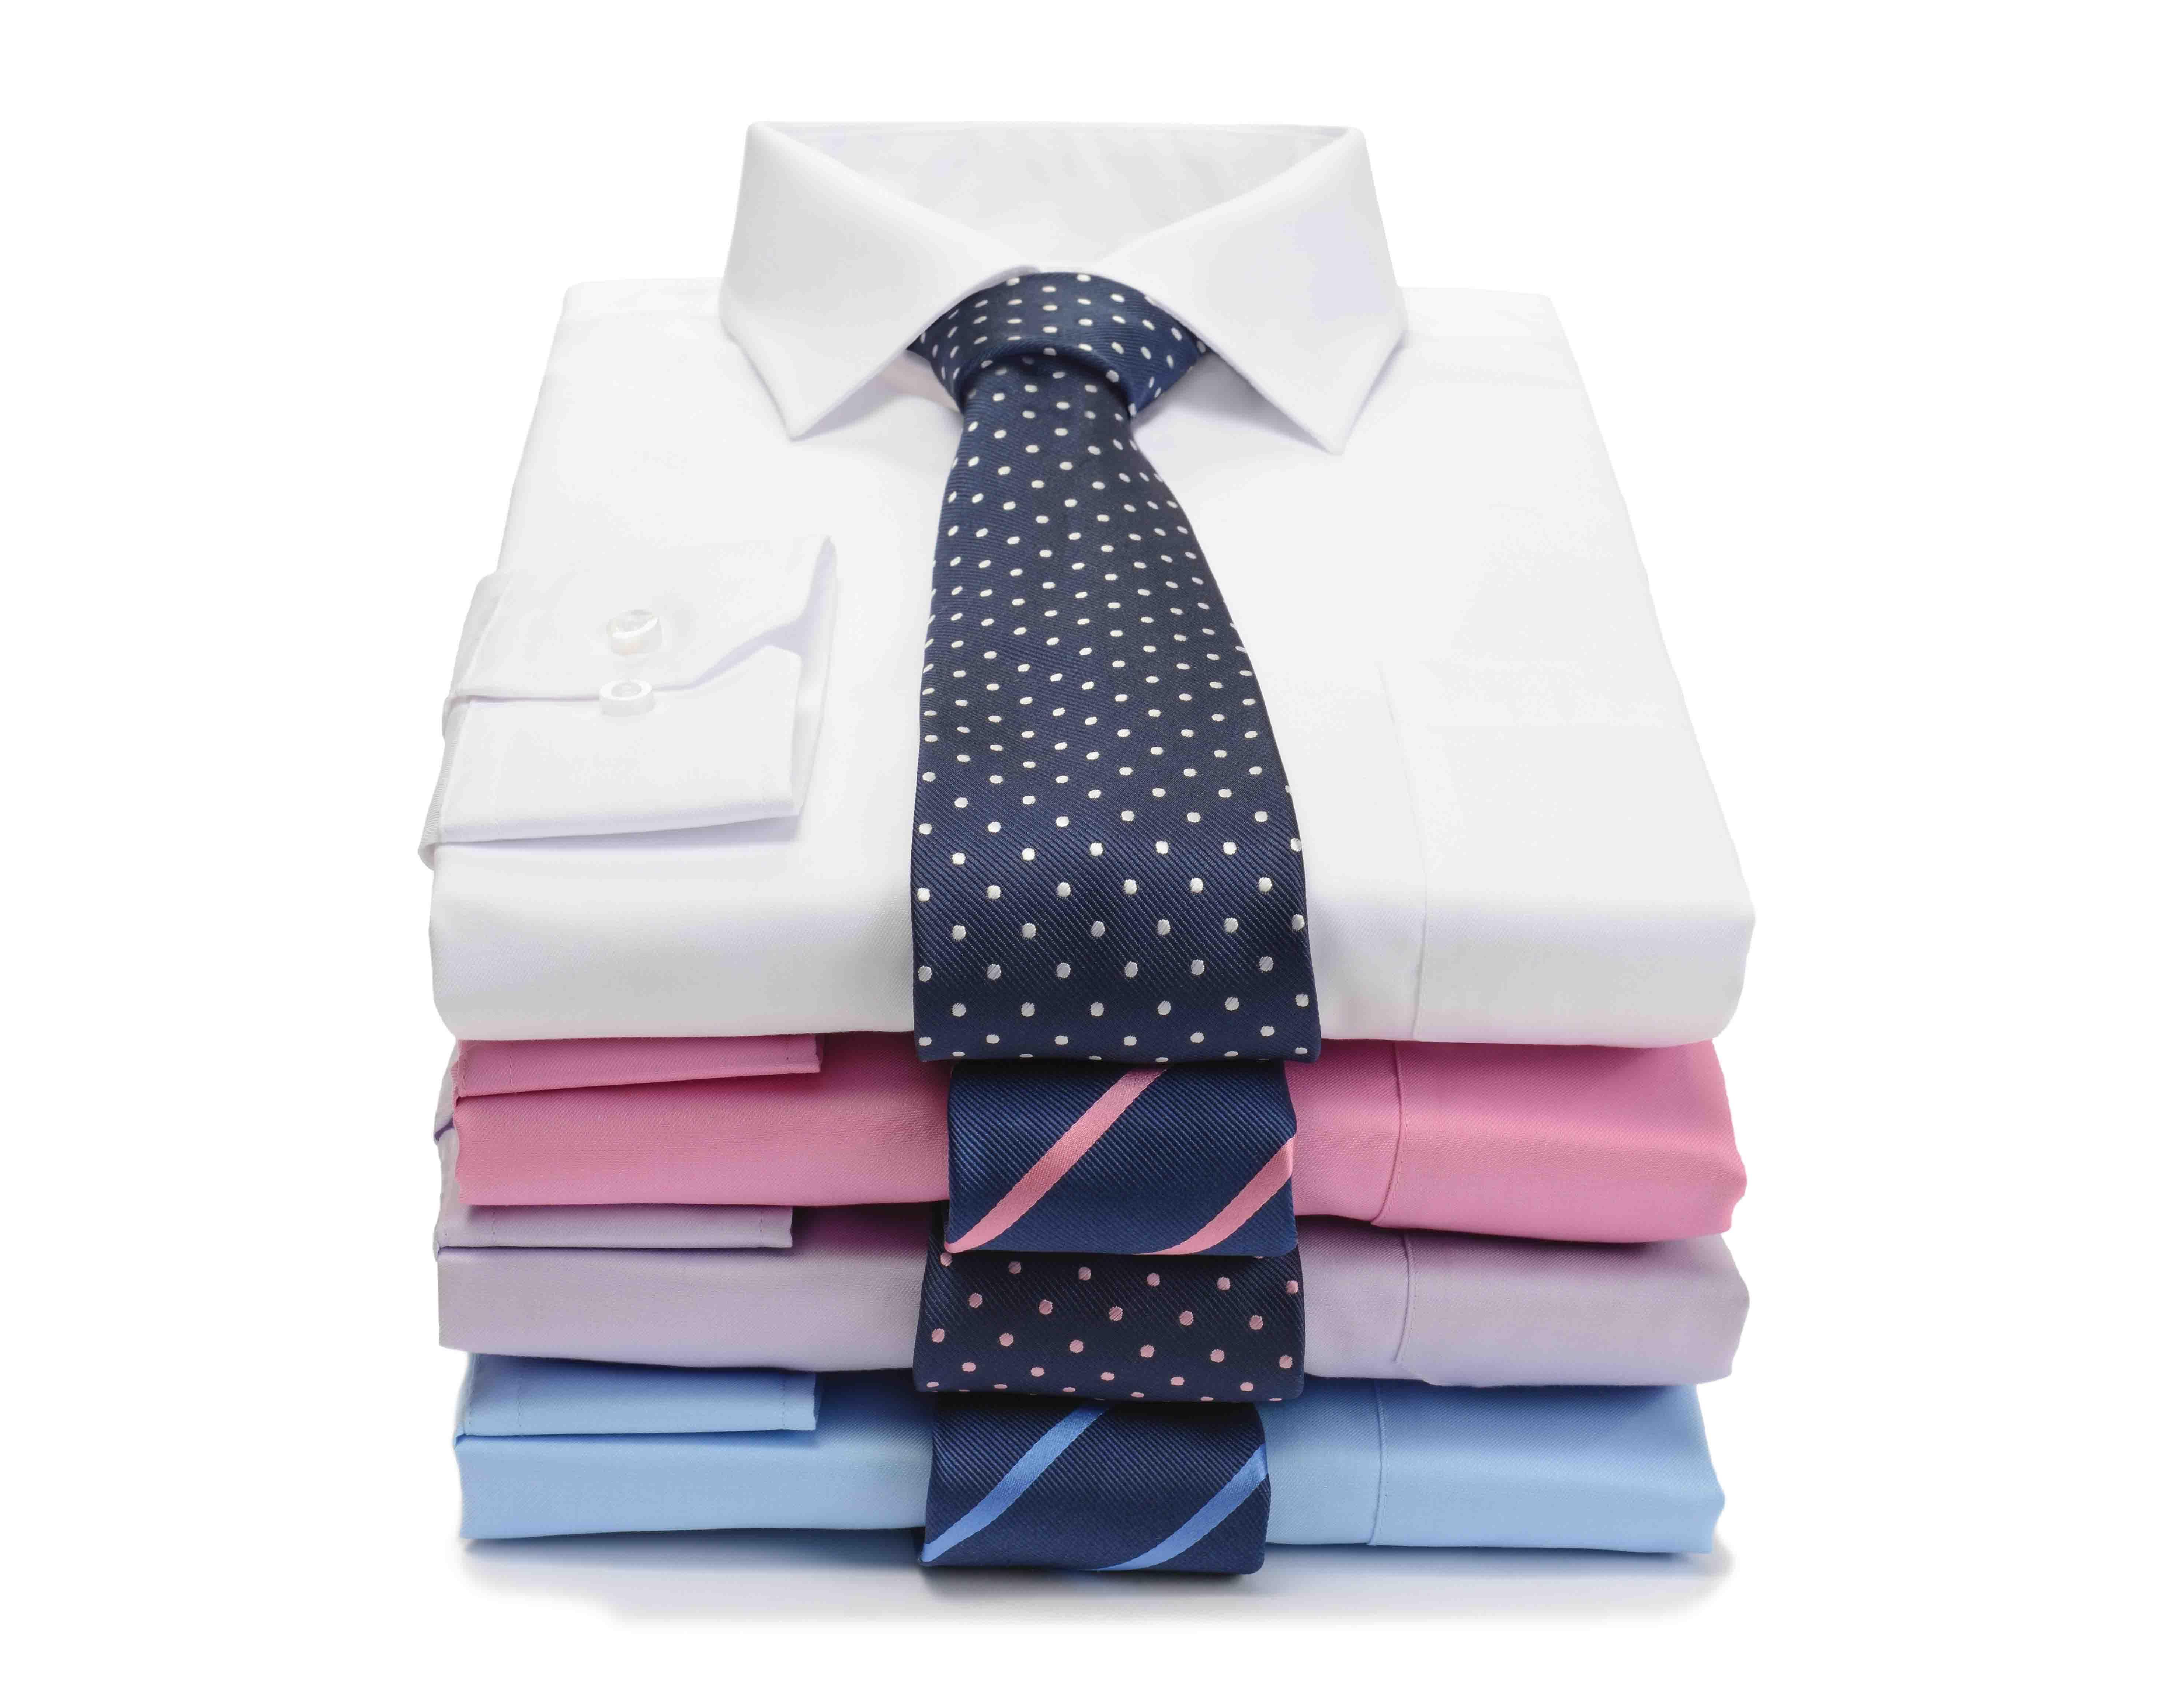 Quality shirts that last